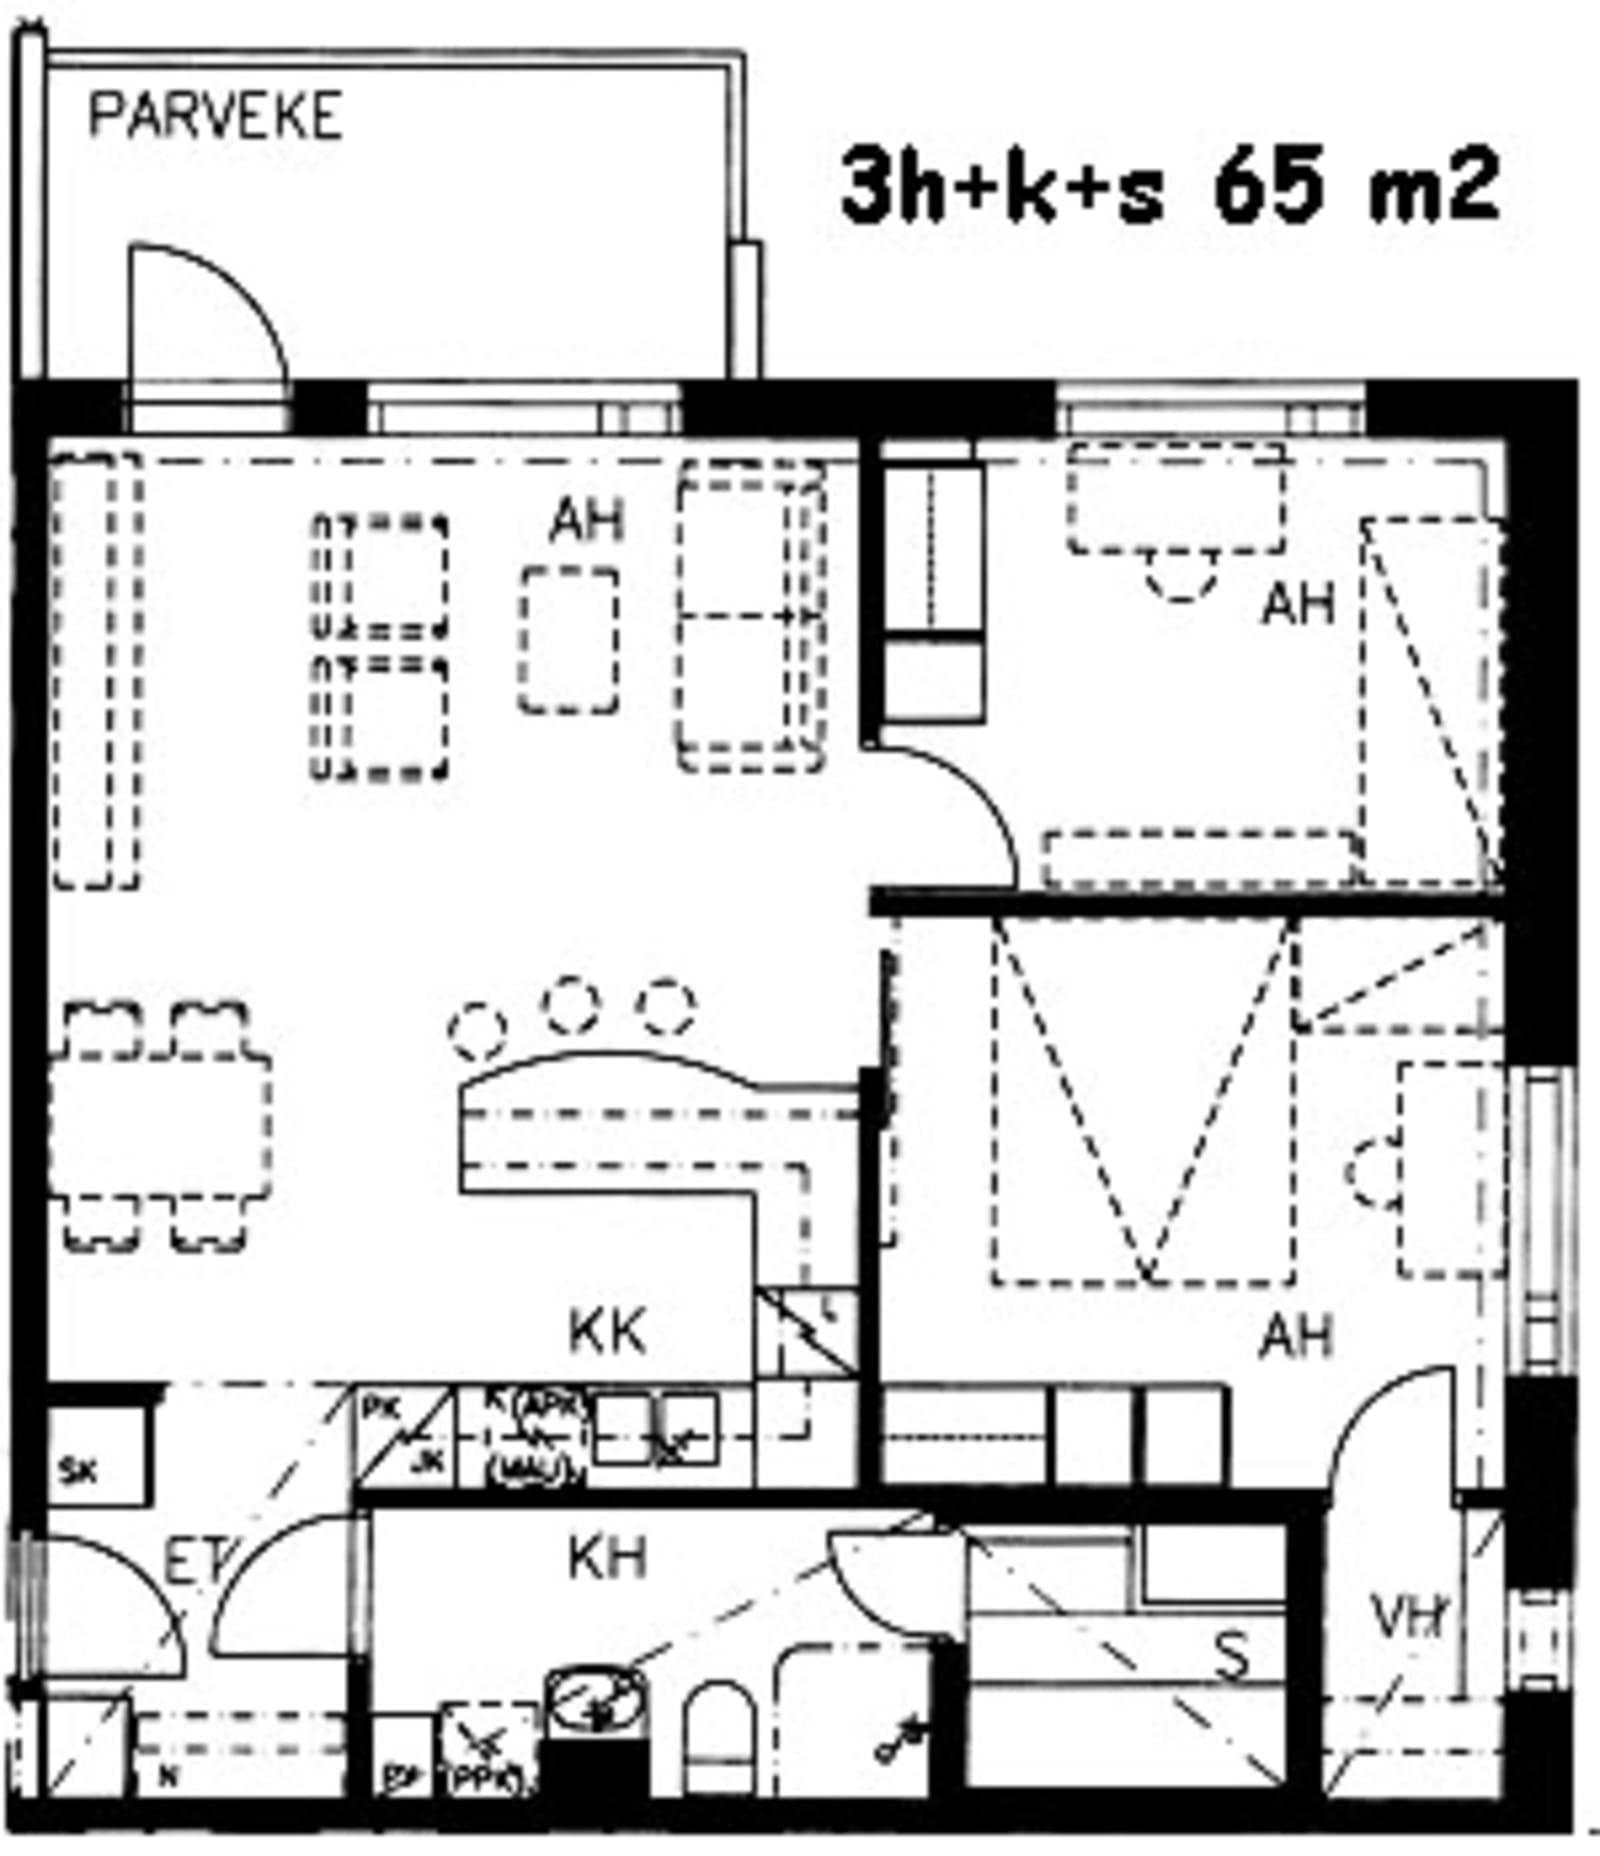 Turku, Itäharju, Ruukinkatu 1 a B 047